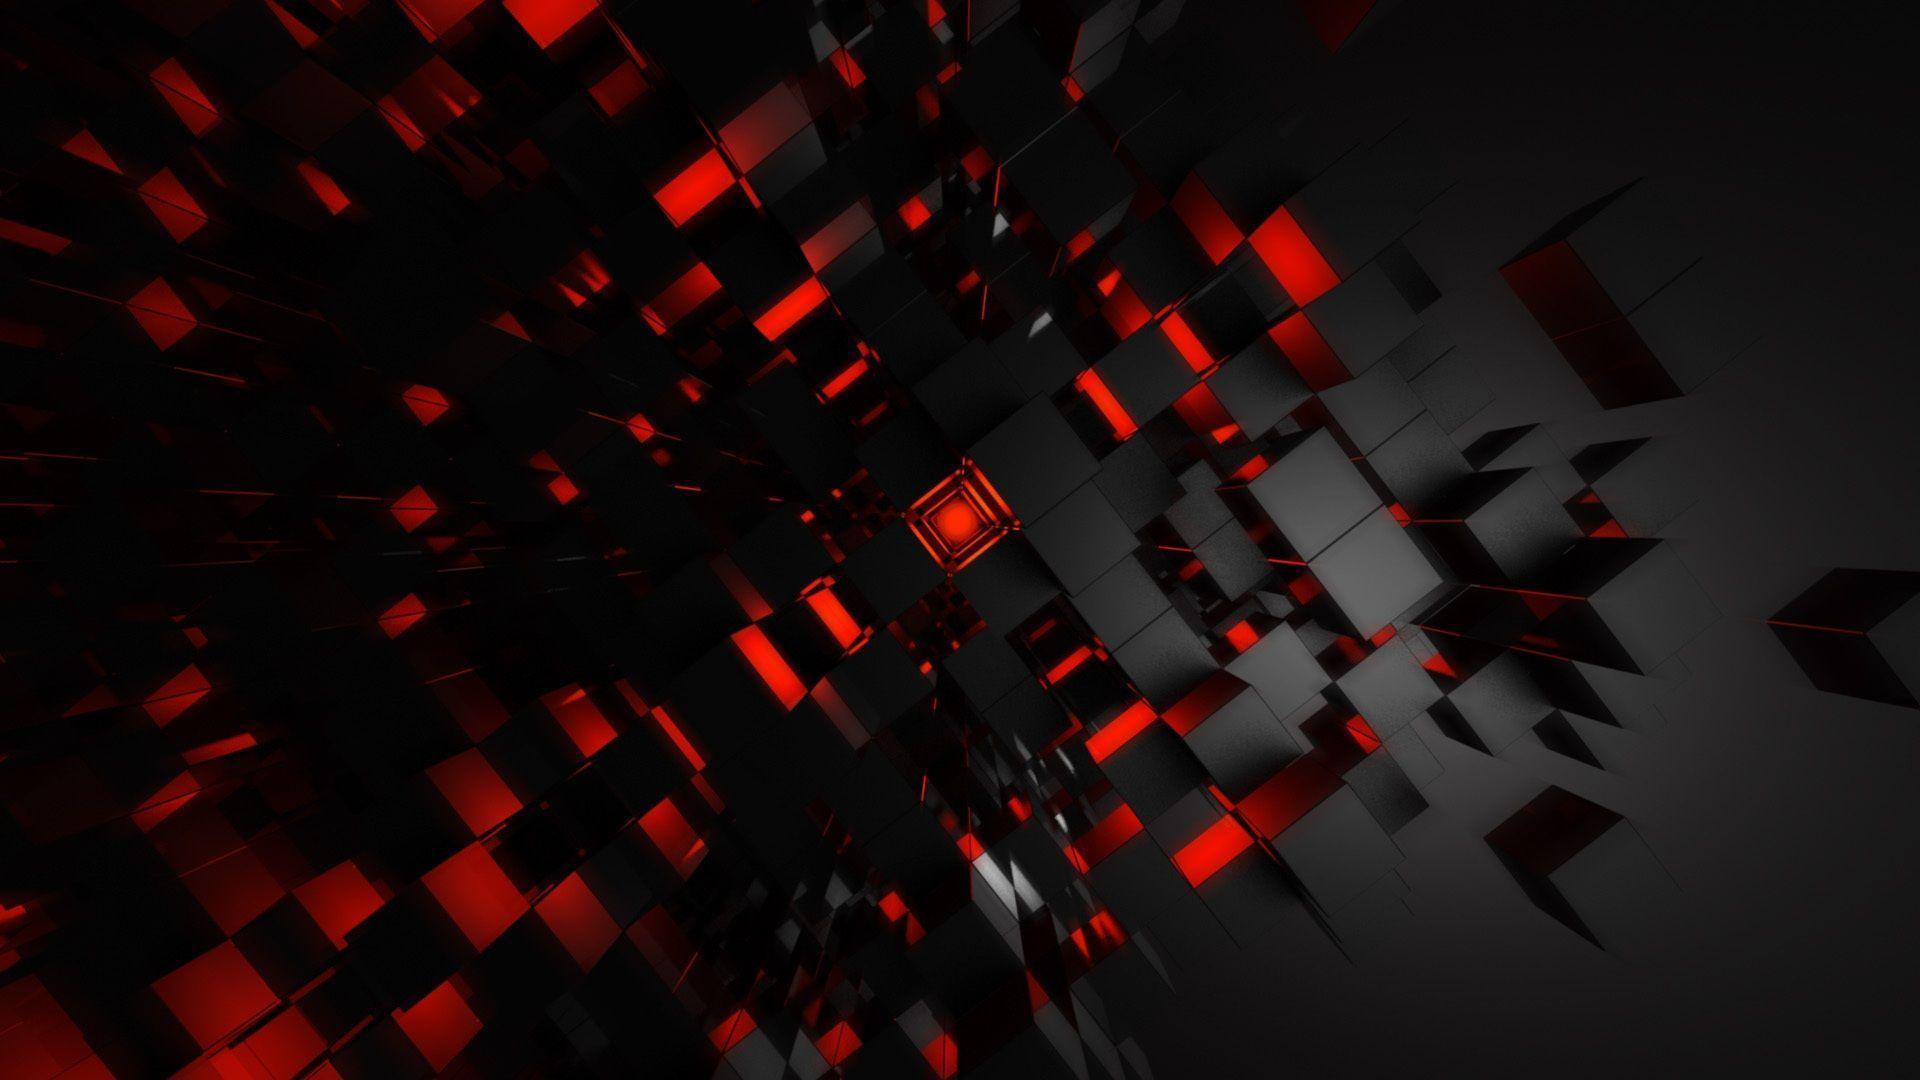 1080p Arka Plan önerisi Technopat Sosyal